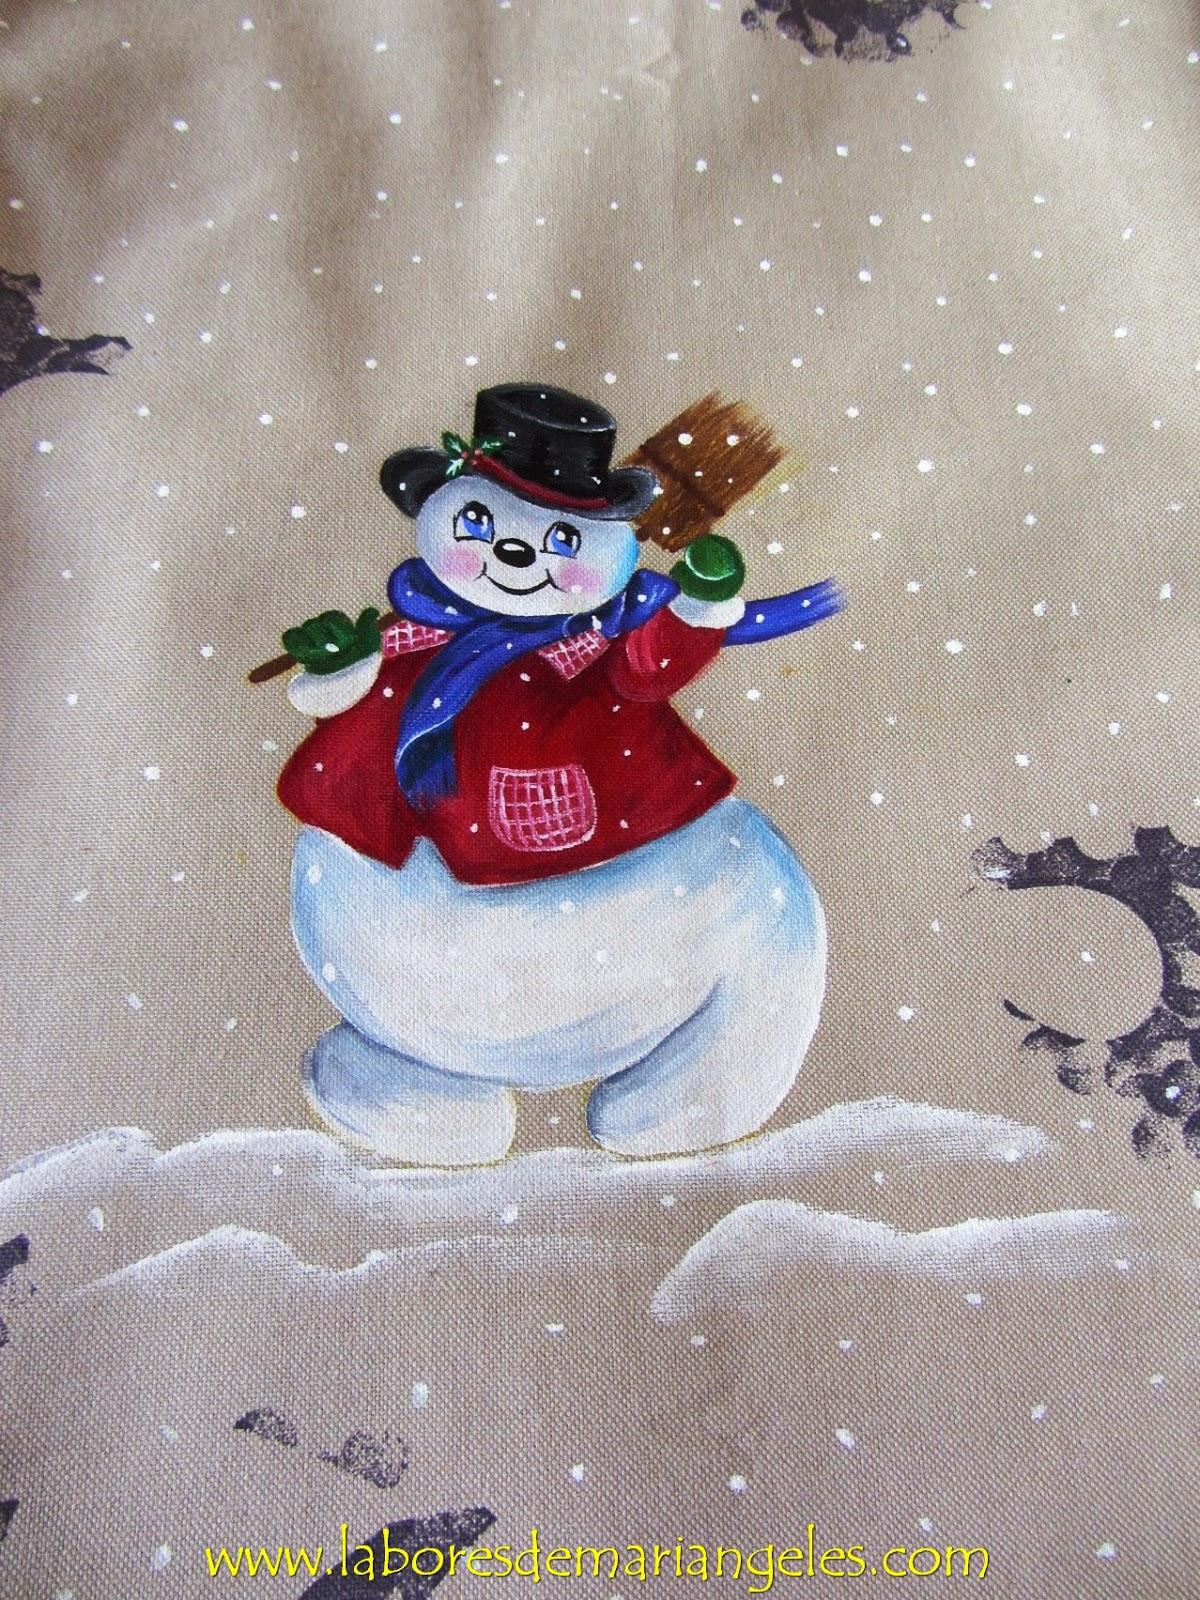 Labores de mari angeles pintando sobre tela motivos navide os - Pintura en tela motivos navidenos ...